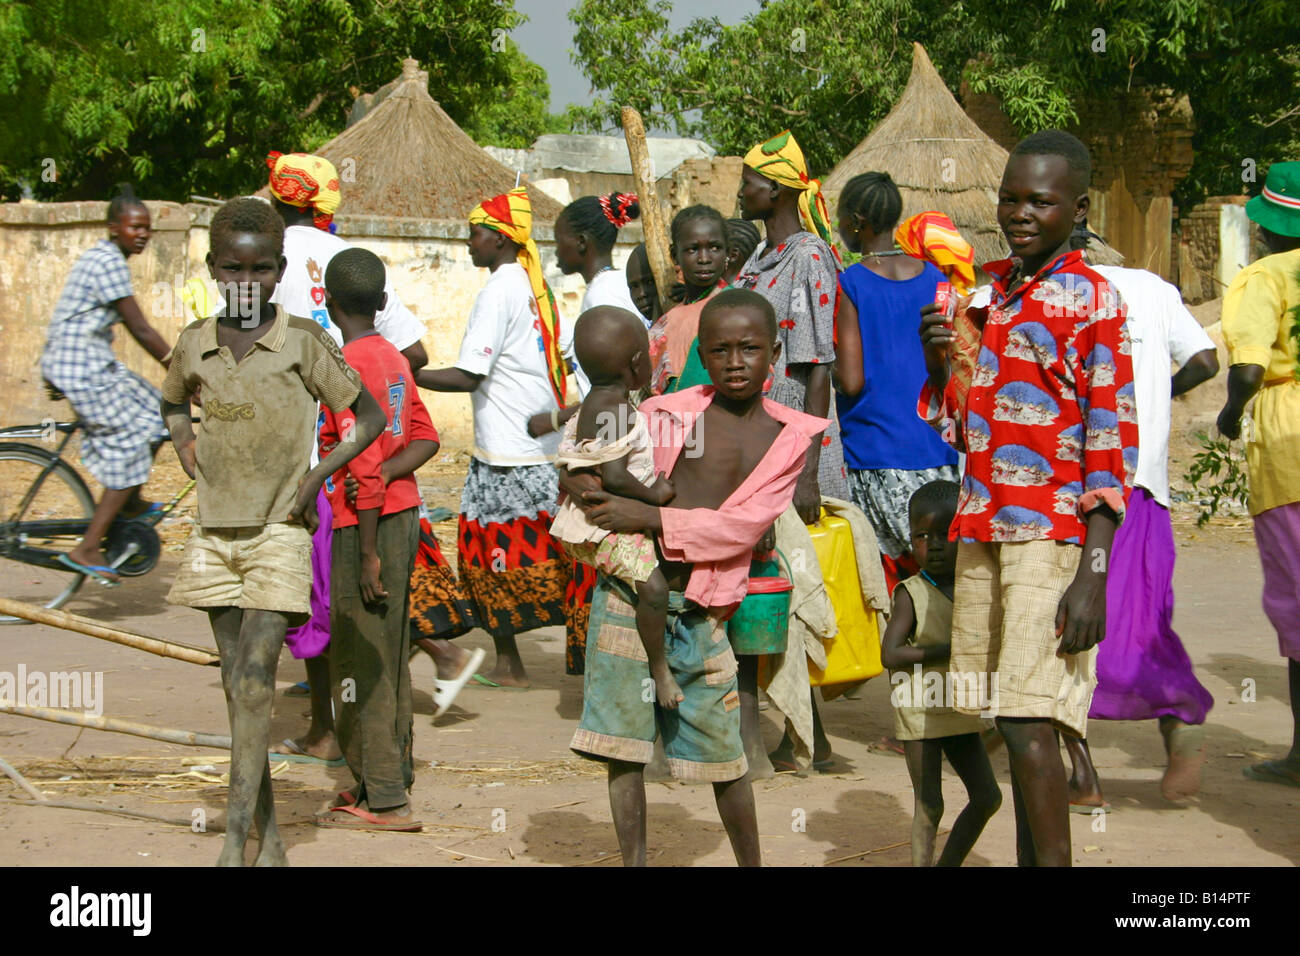 People in the market in Rumbek, South Sudan - Stock Image